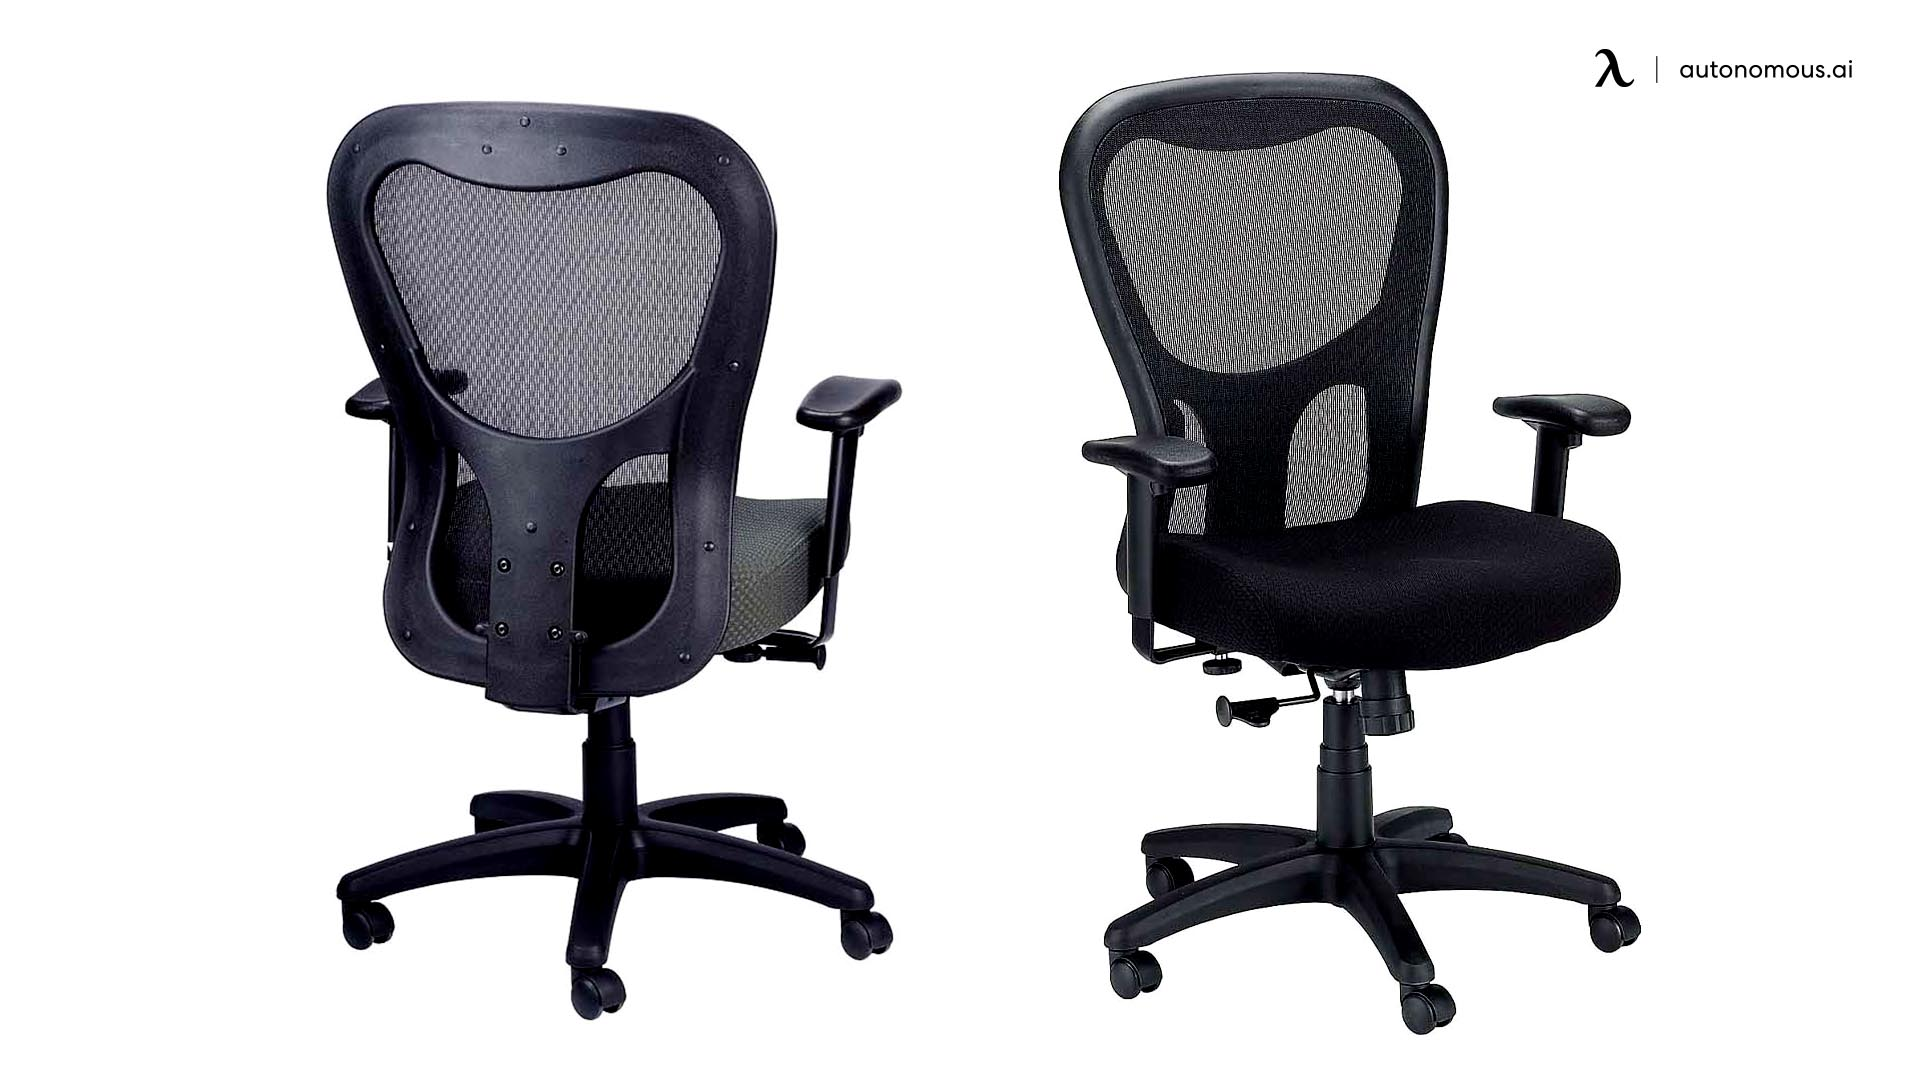 Tempur-Pedic TP9000 Mesh Chair with Lumbar Support